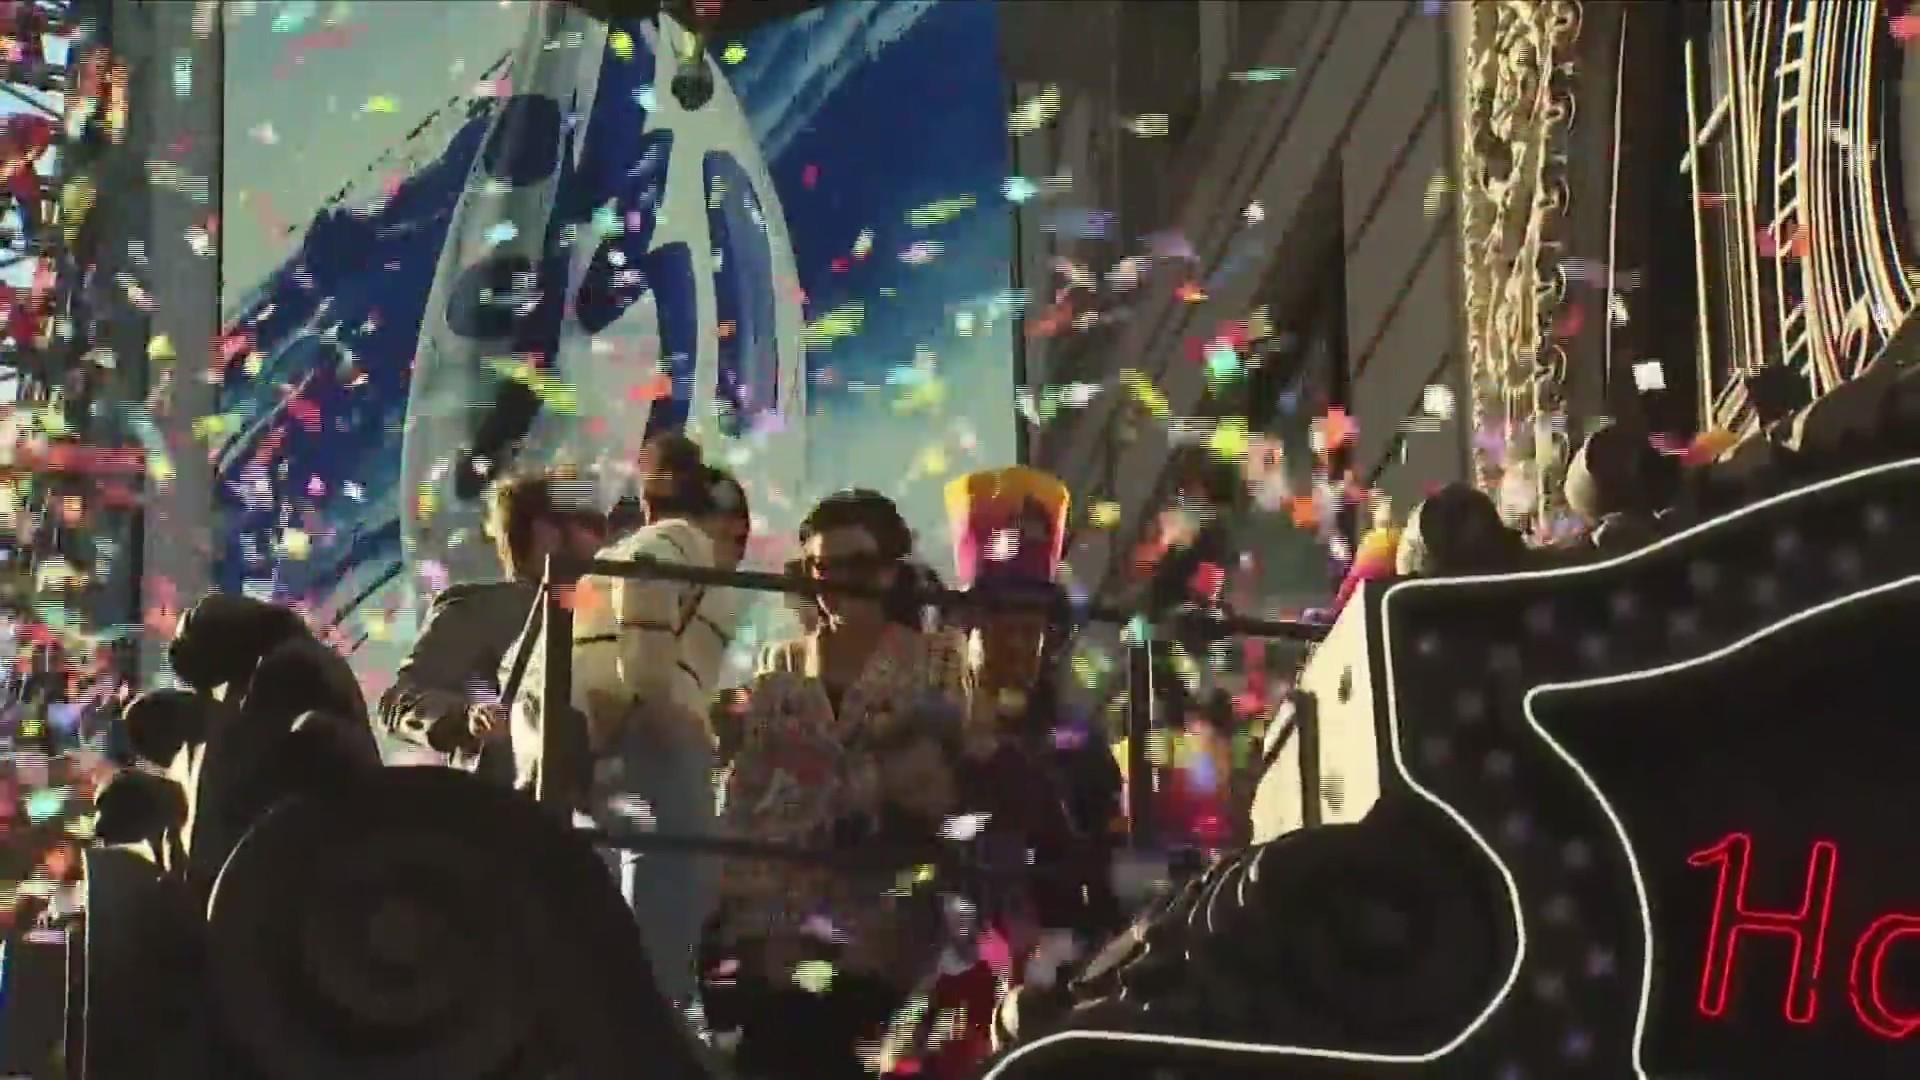 New Year's celebrations across the region